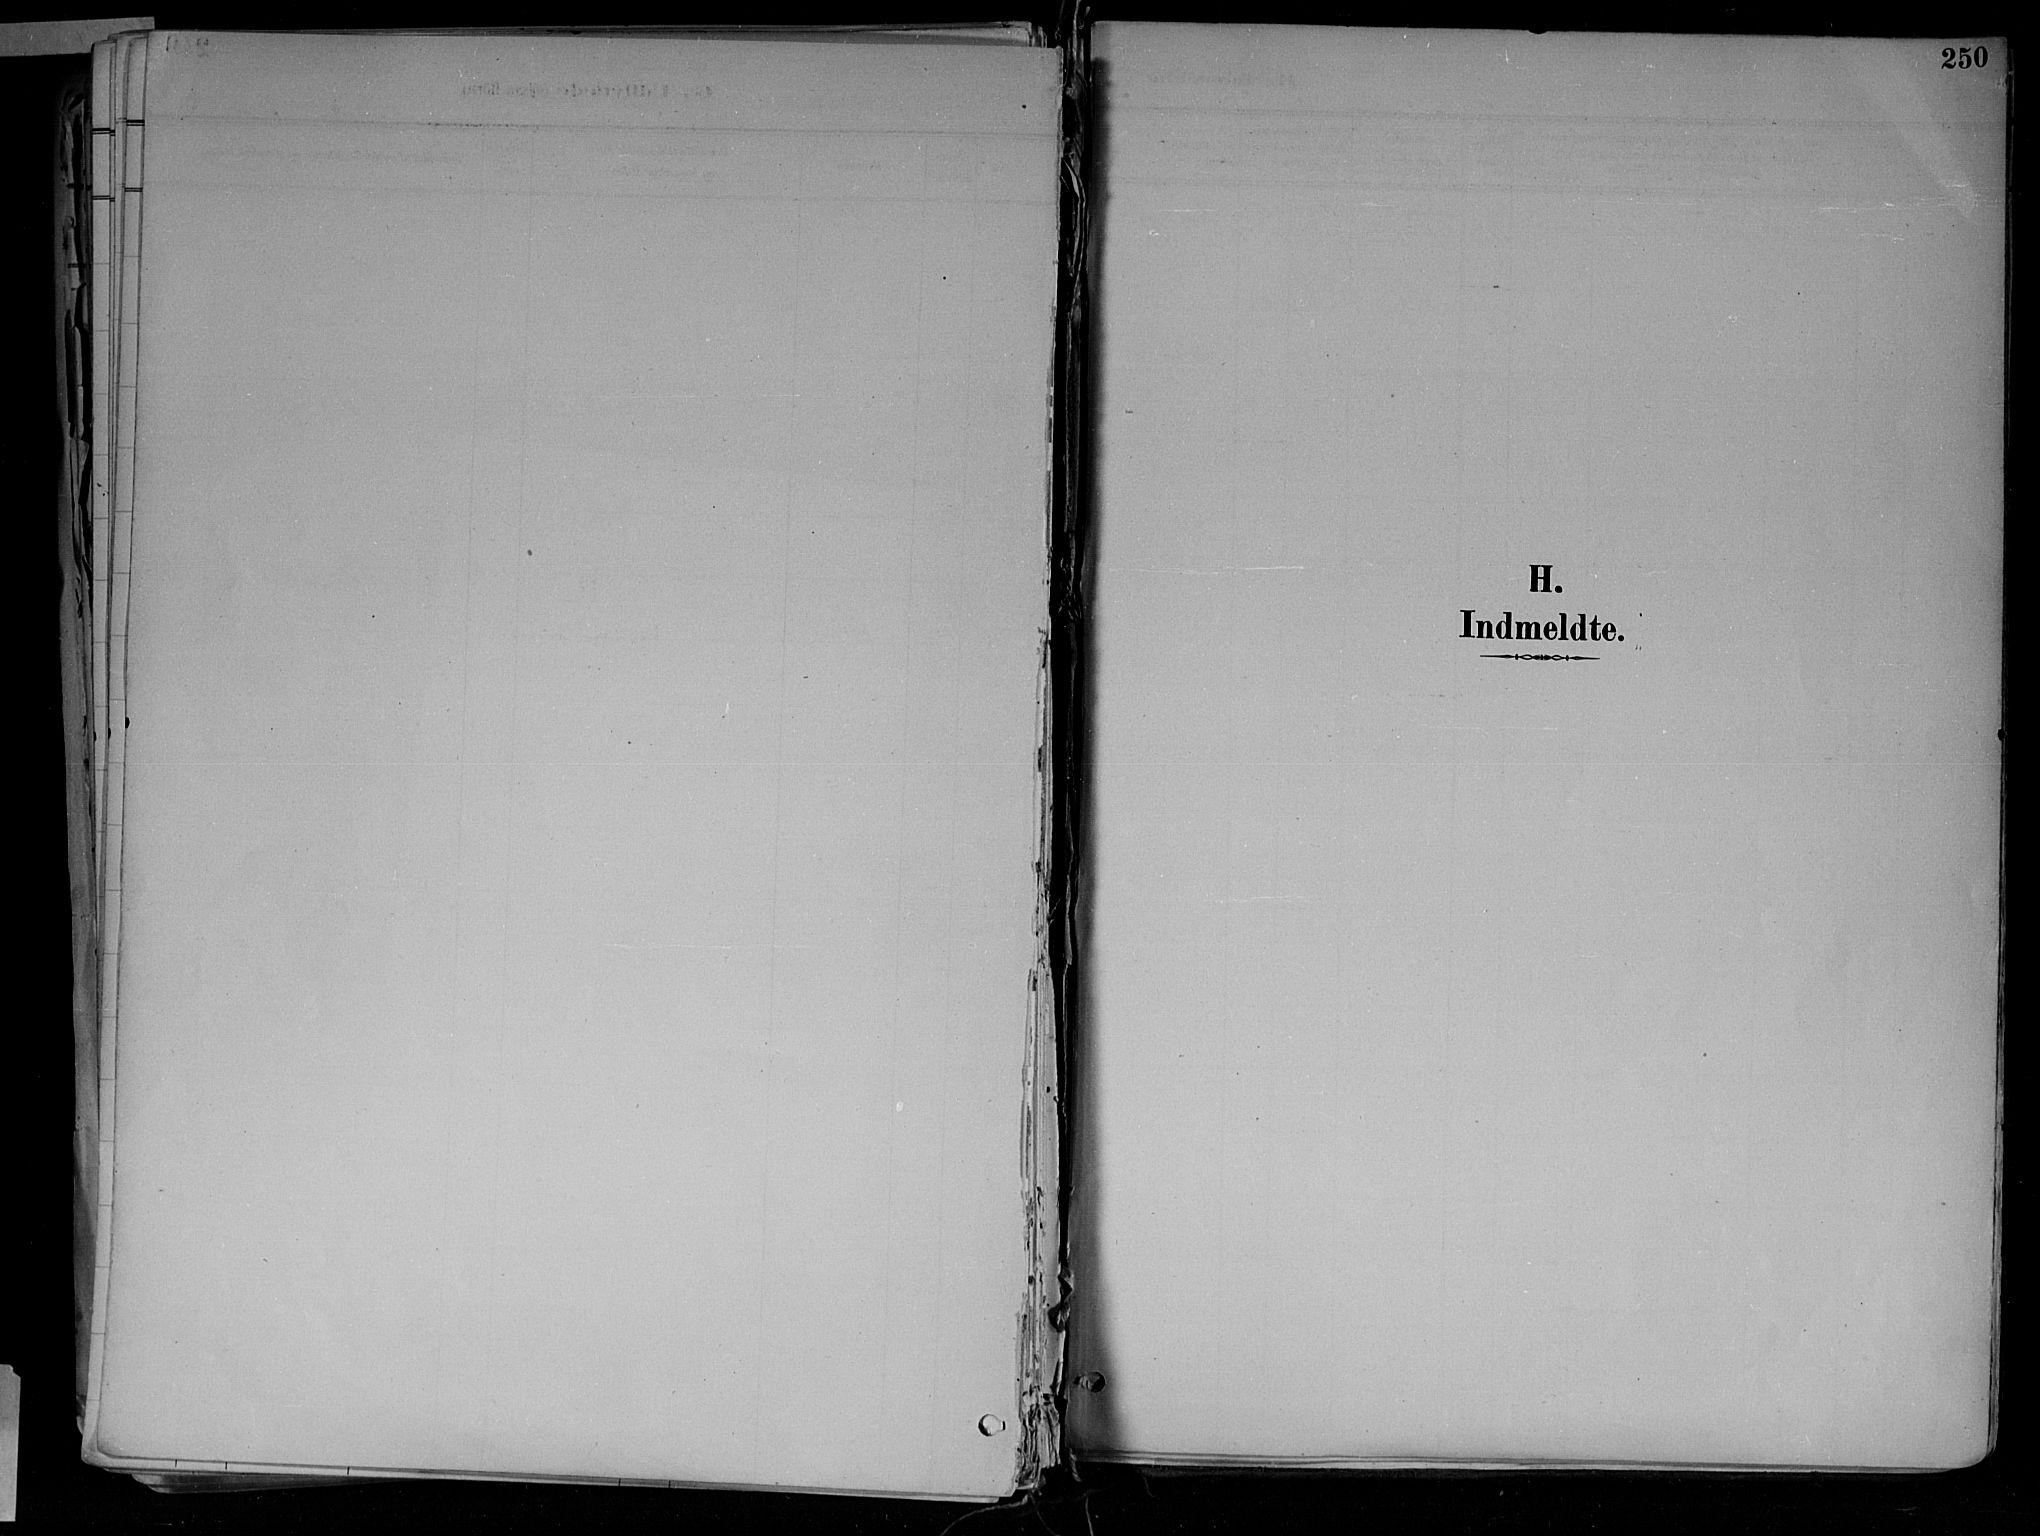 SAH, Jevnaker prestekontor, Ministerialbok nr. 10, 1891-1906, s. 250